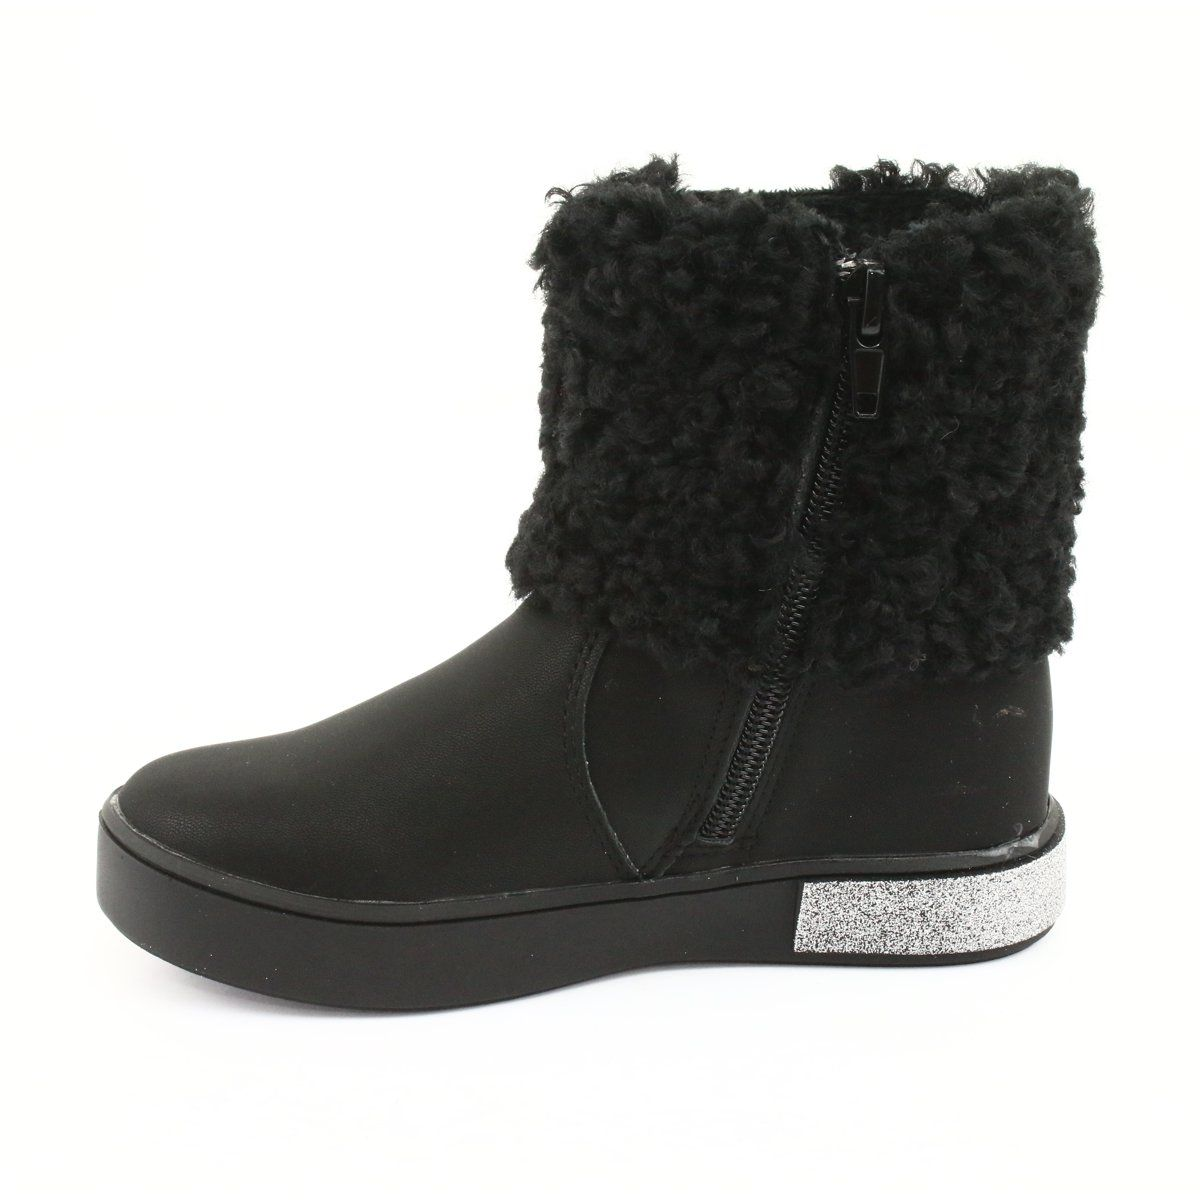 American Club Kozaczki Z Futerkiem Na Suwak Gc35 Czarne Szare Boots Fur Boots Childrens Boots